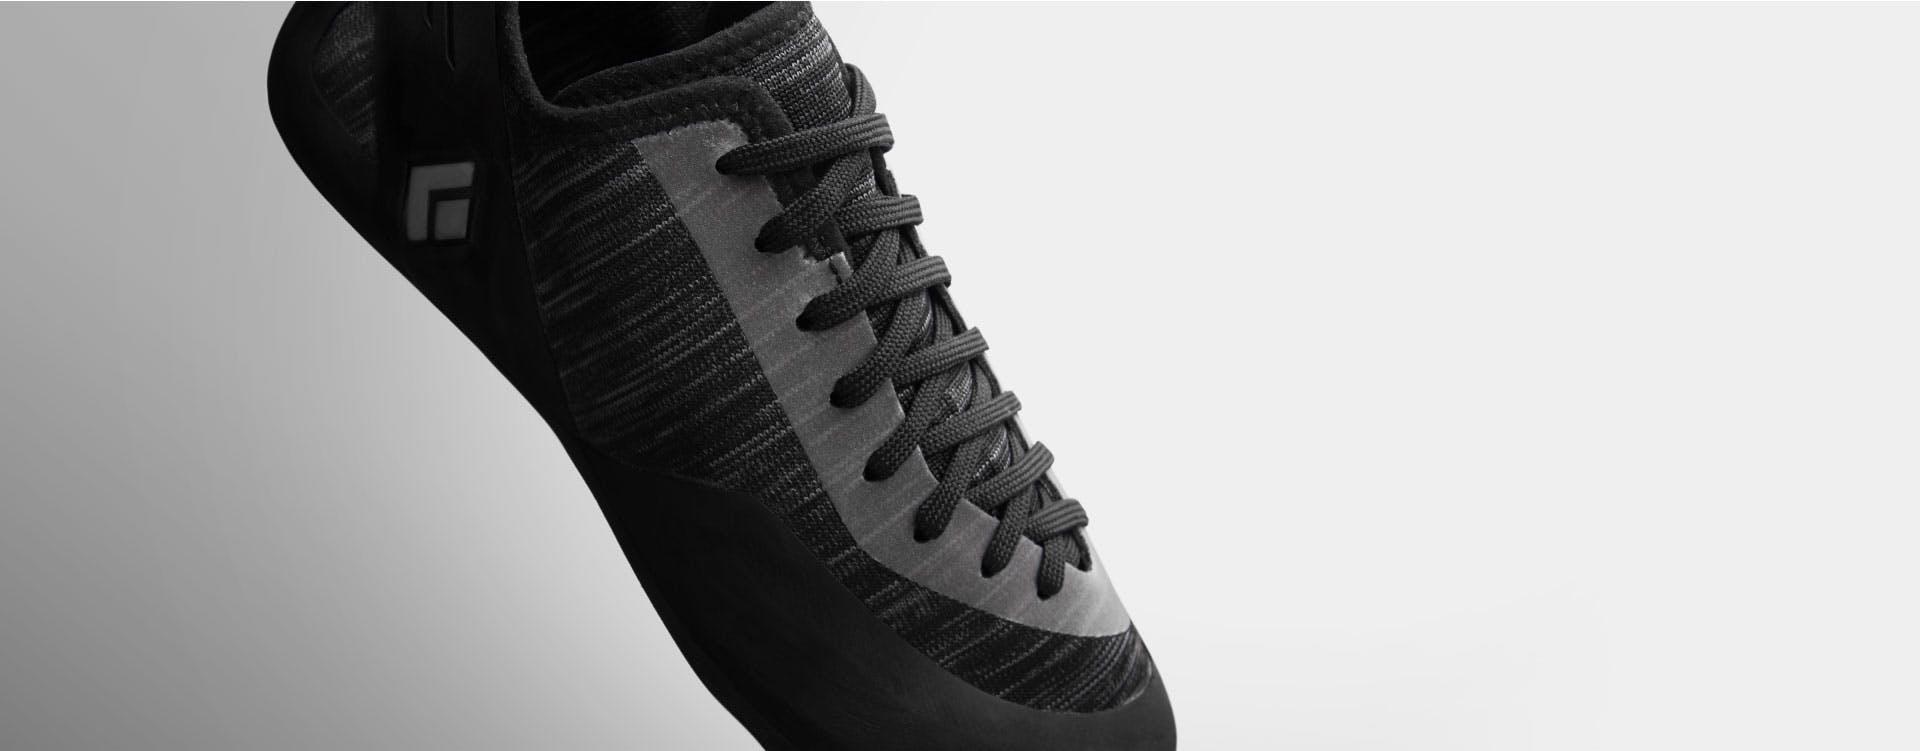 close up of BD shoe